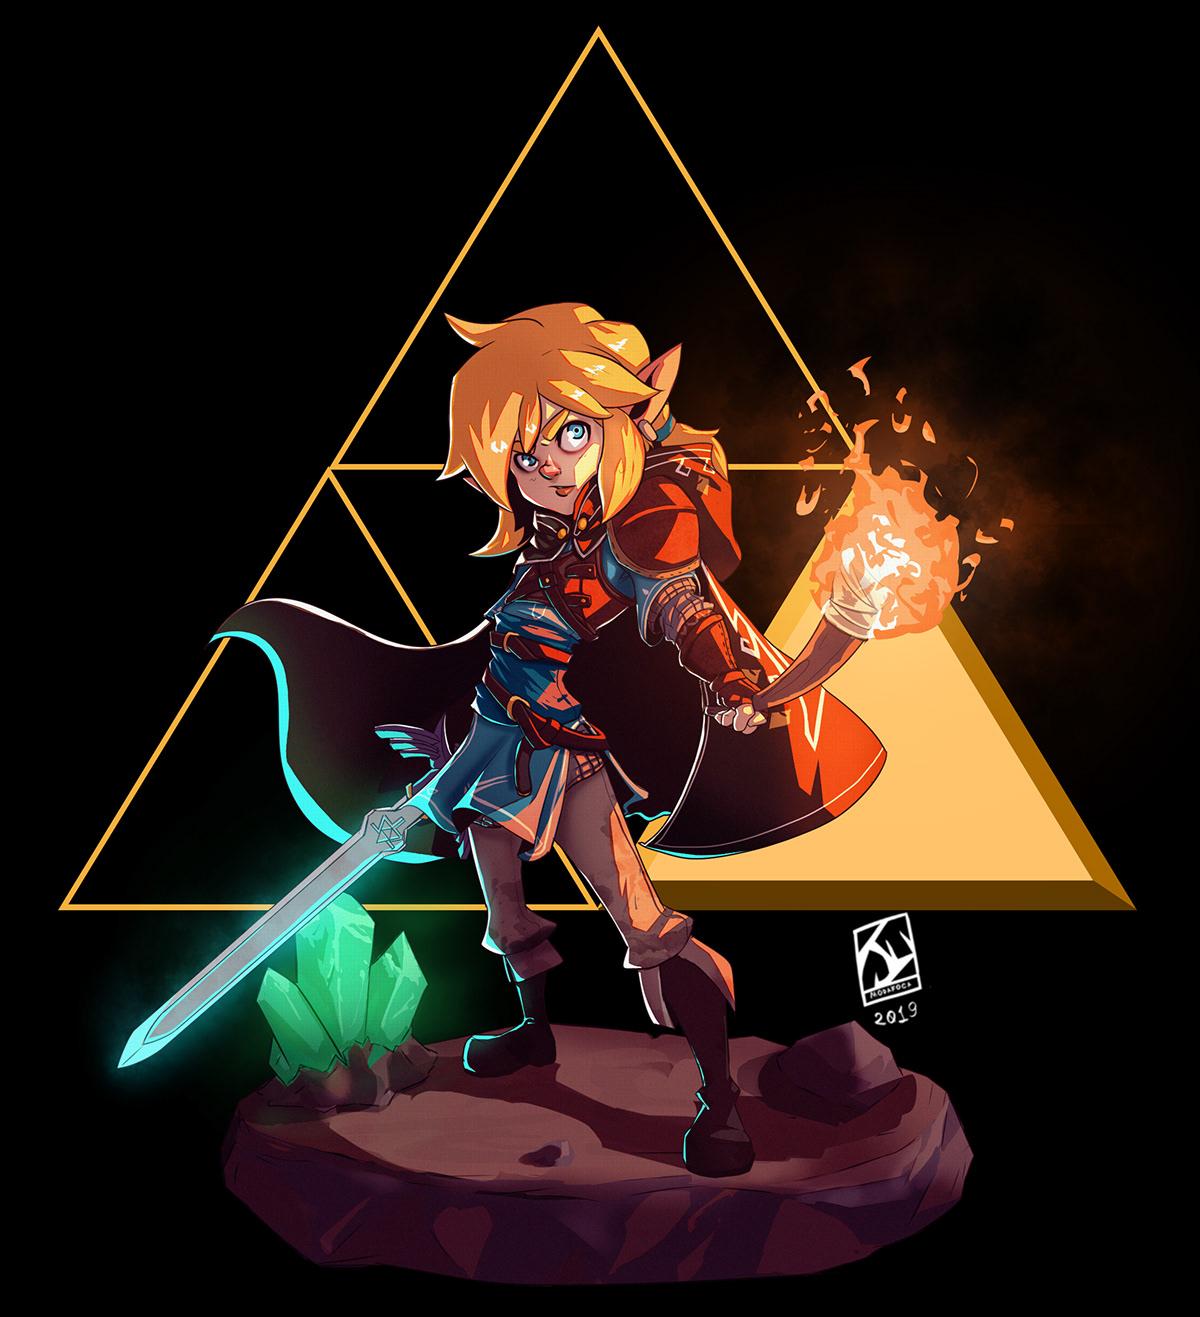 Zelda Breath Of The Wild Sequel Fanart On Behance